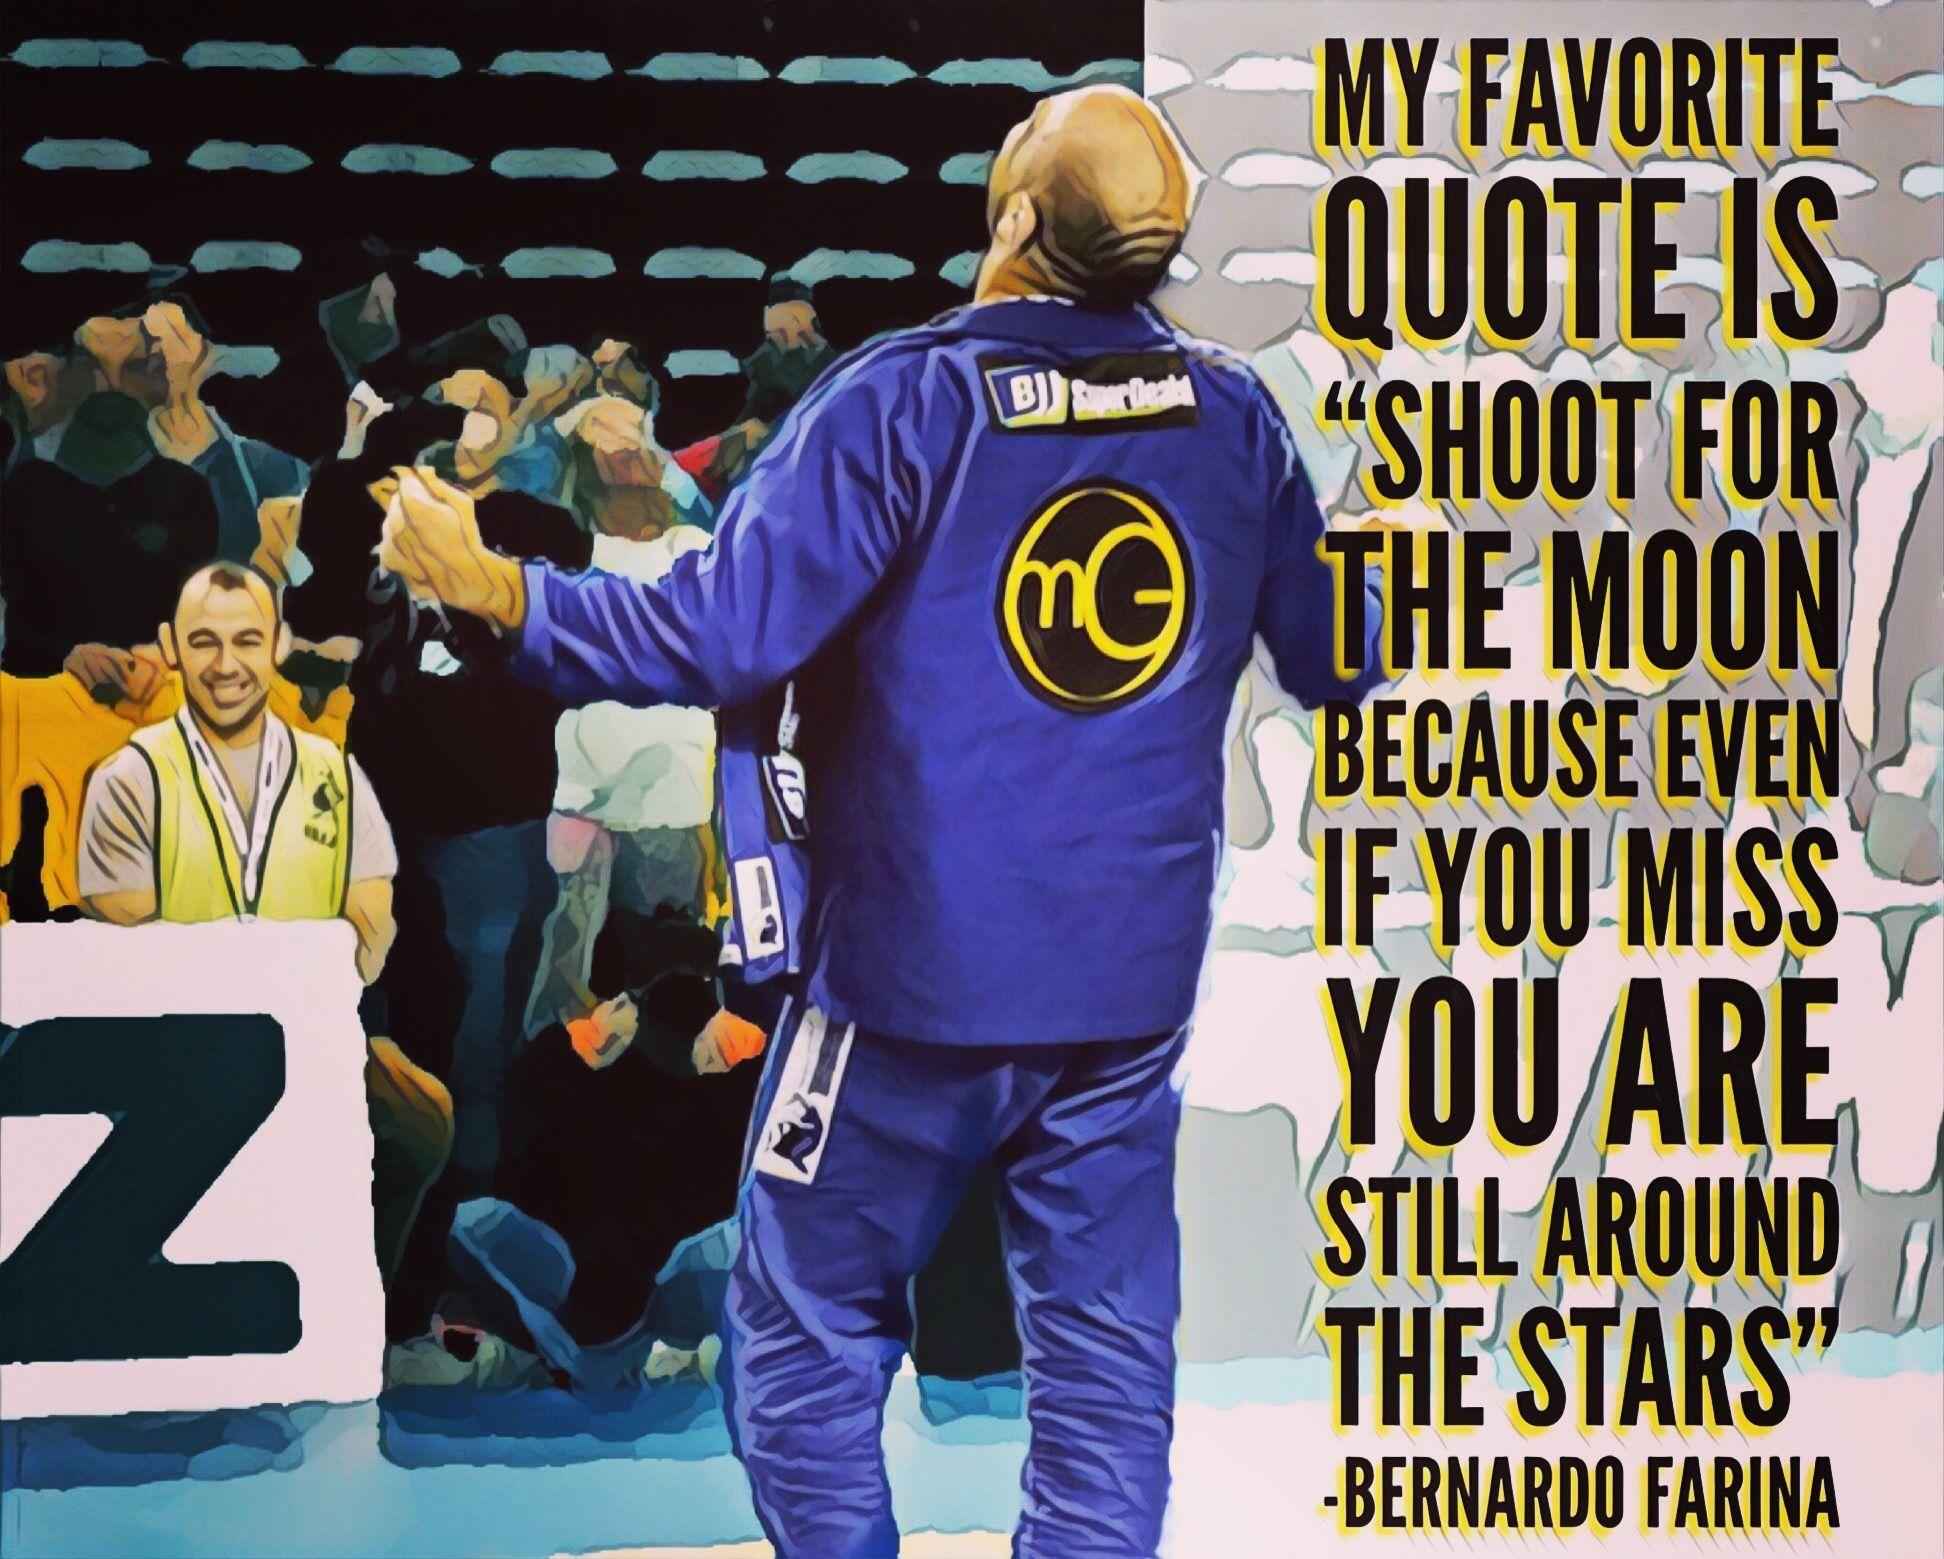 Bernardo Faria ufc mma bjj Jiujitsu Brazilian jiu Jitsu fighter